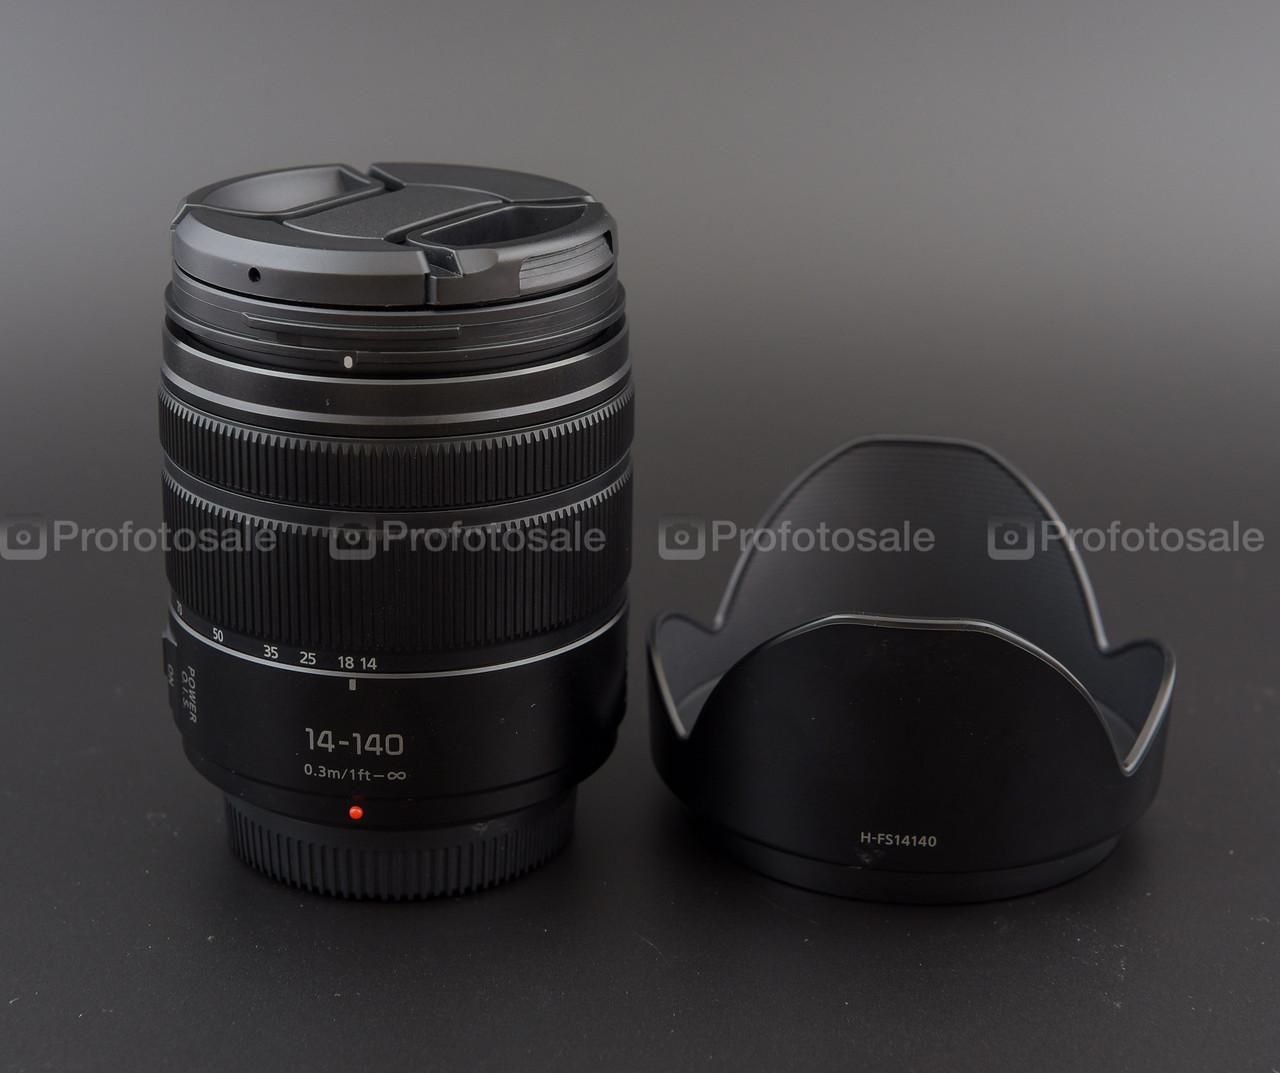 Panasonic Lumix G Vario 14-140 mm f/3.5-5.6 ASPH (H-FS14140)